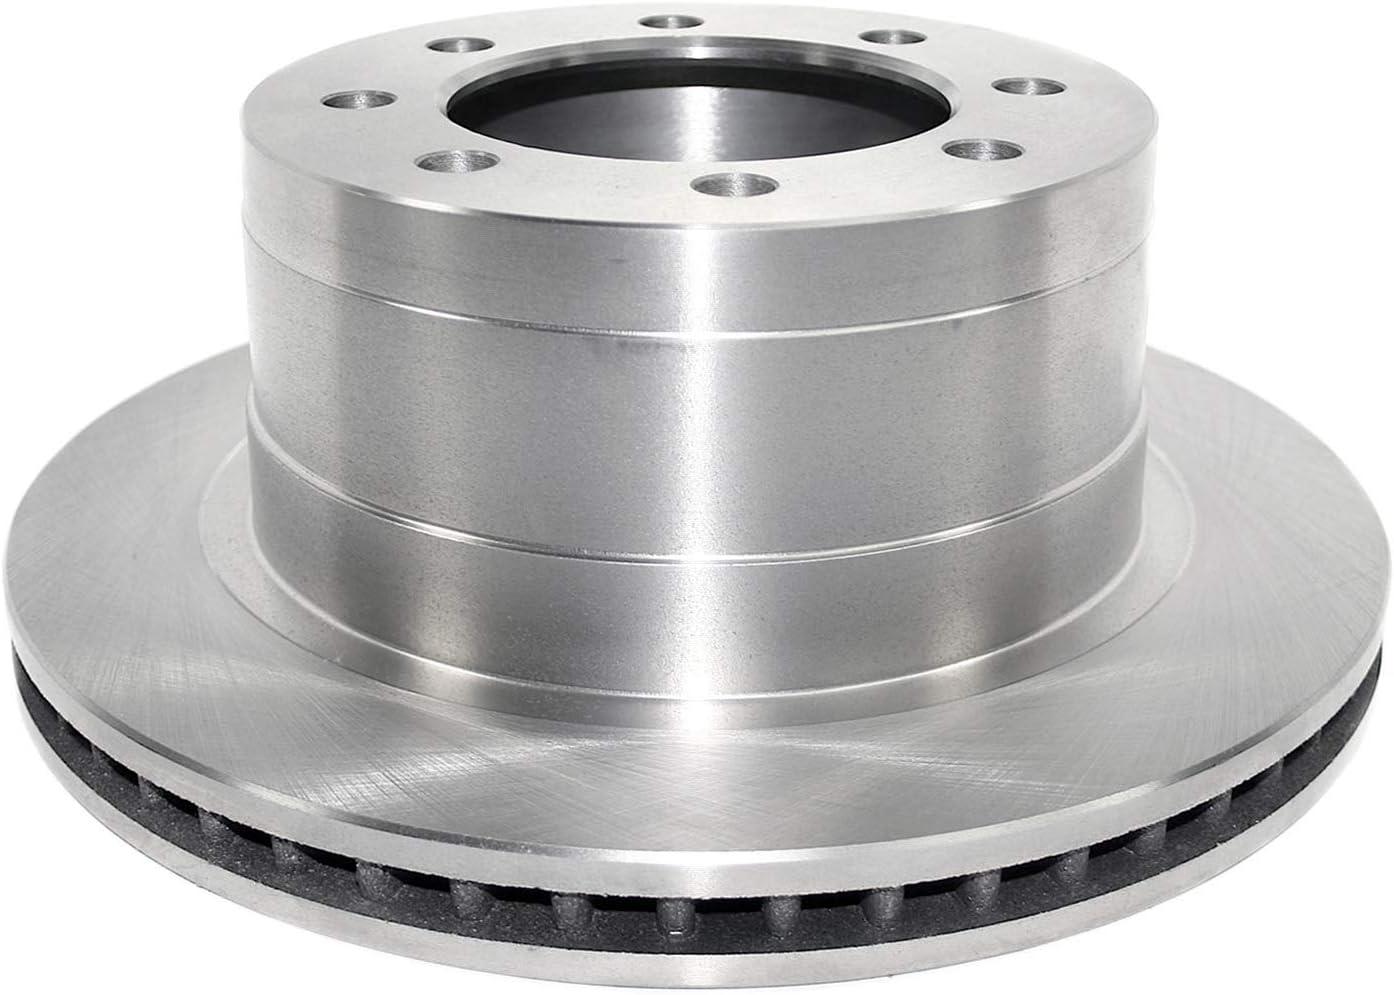 DuraGo BR53011 Rear Vented Disc Brake Rotor